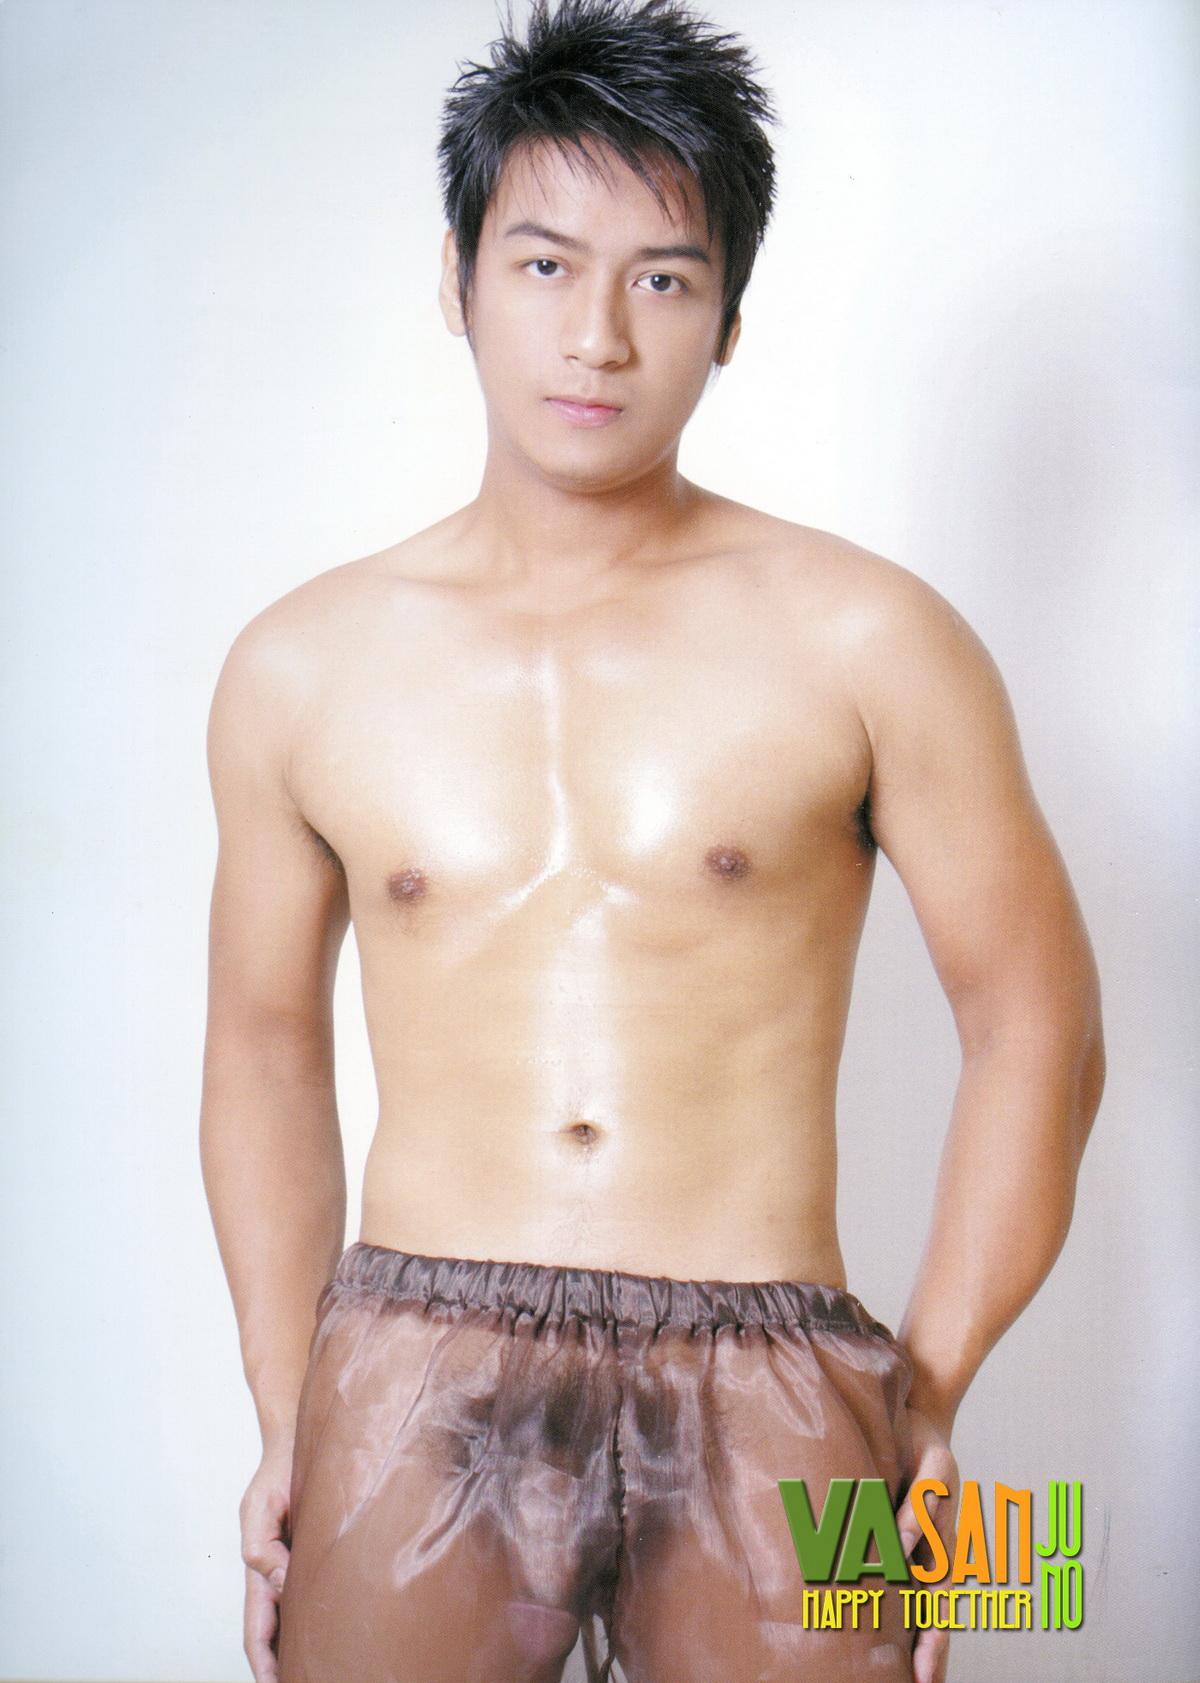 Thai gay video blog